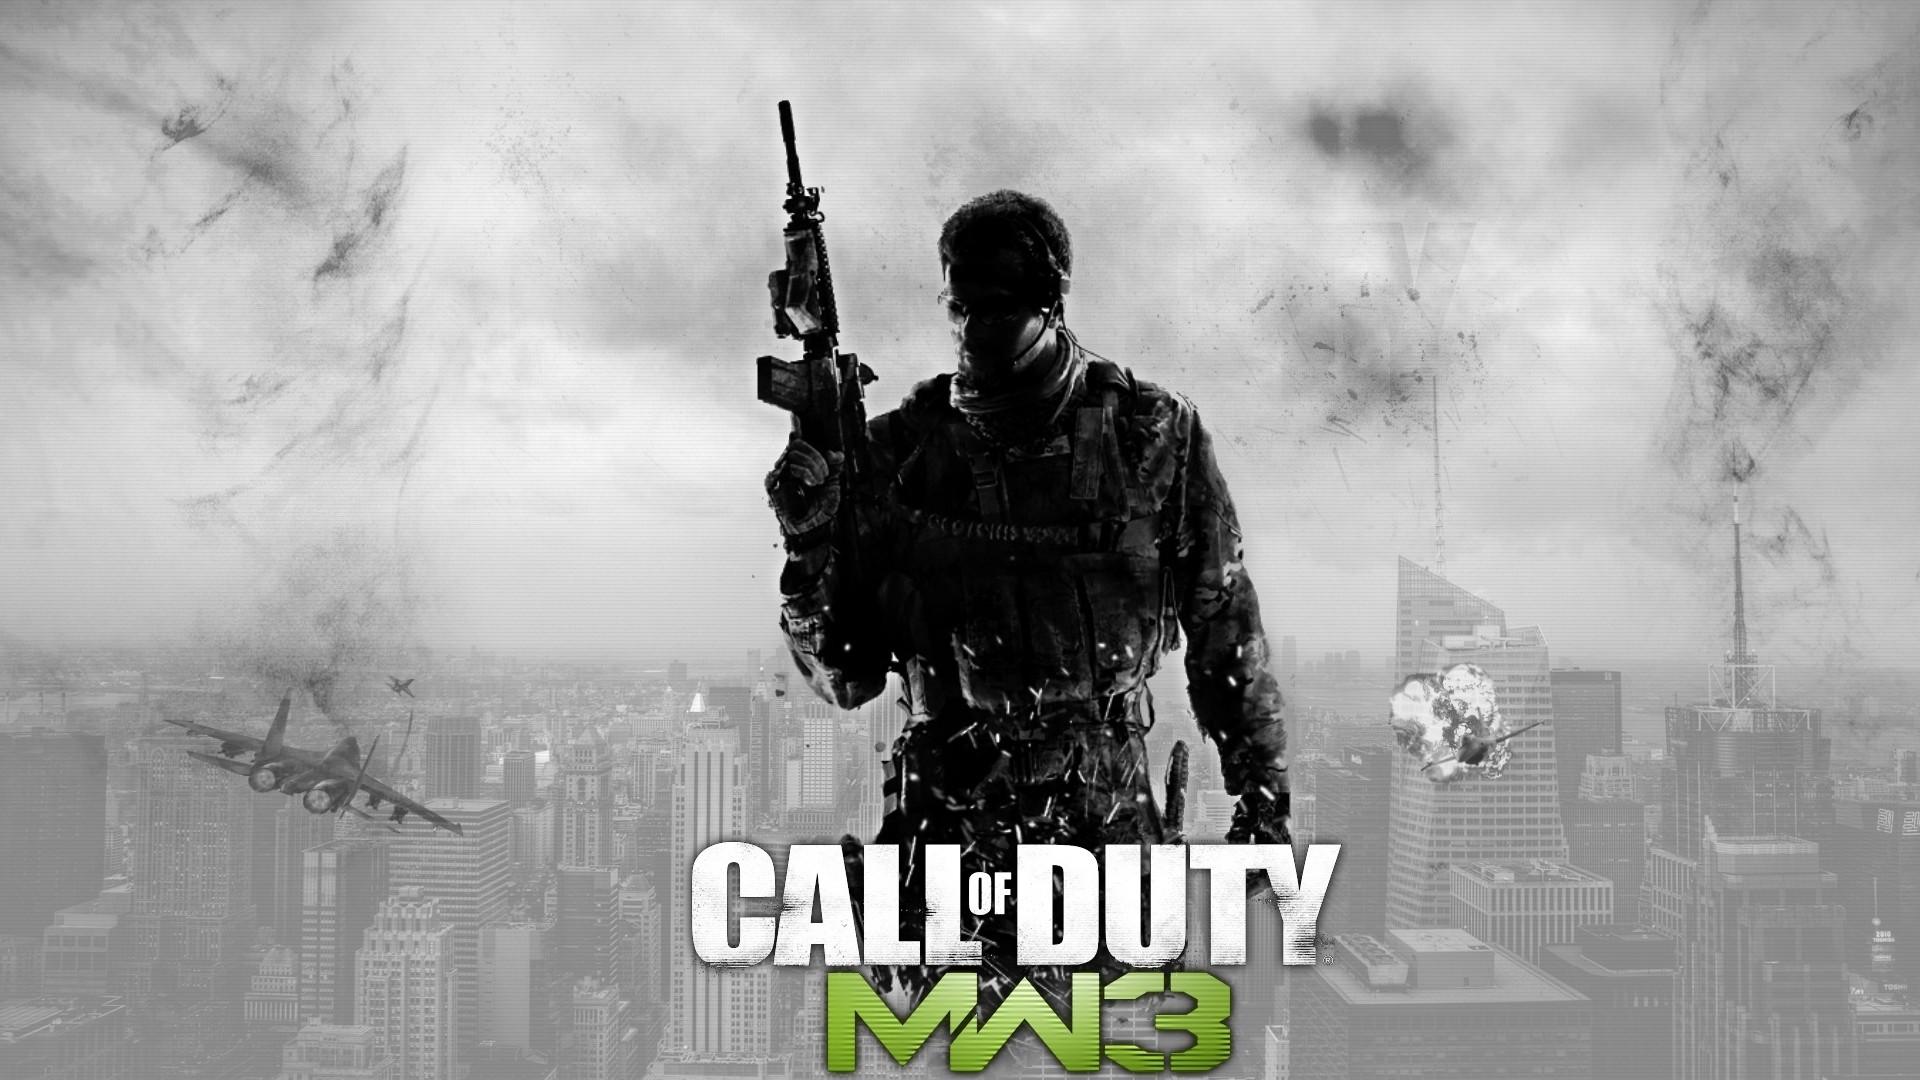 Слухи стала известна дата выхода ремастера Call of Duty Modern Warfare 3